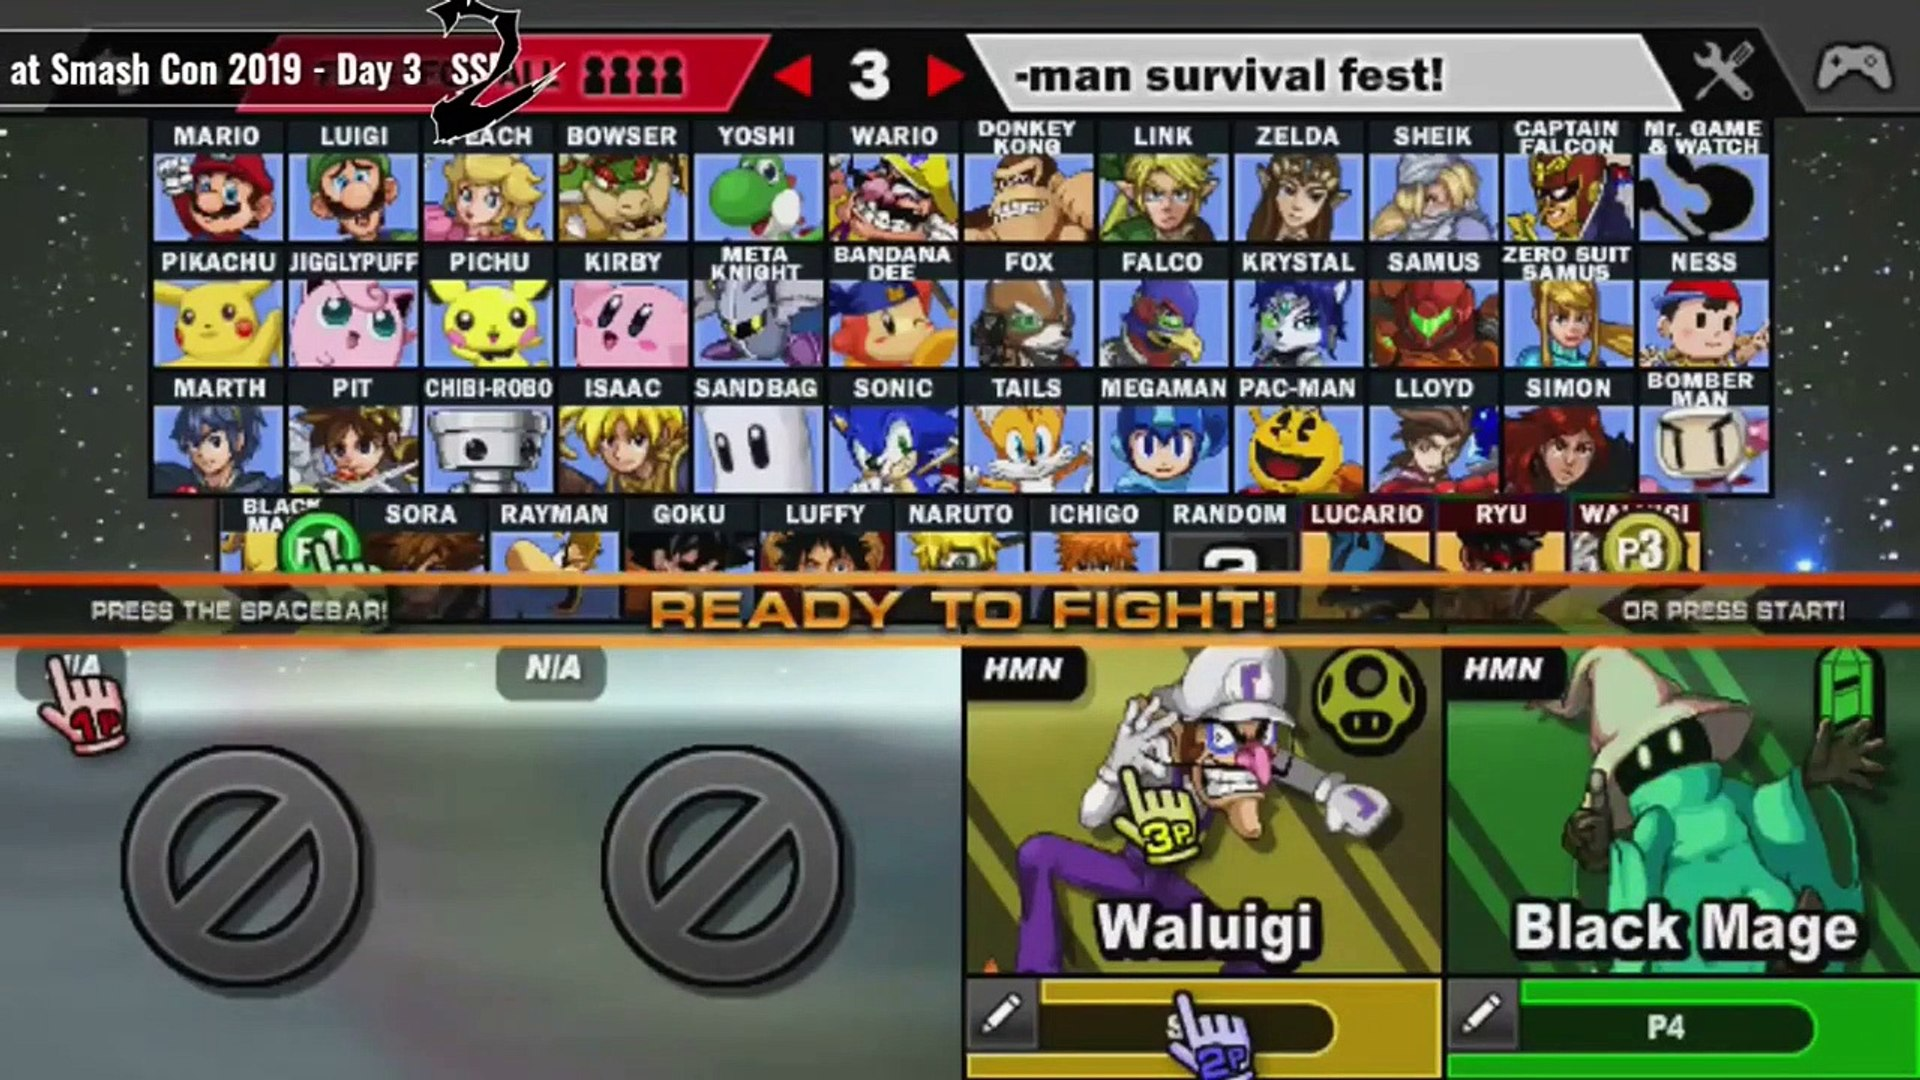 Waluigi Gameplay Ssf2 Beta Smash Con 2019 In Hd Video Dailymotion